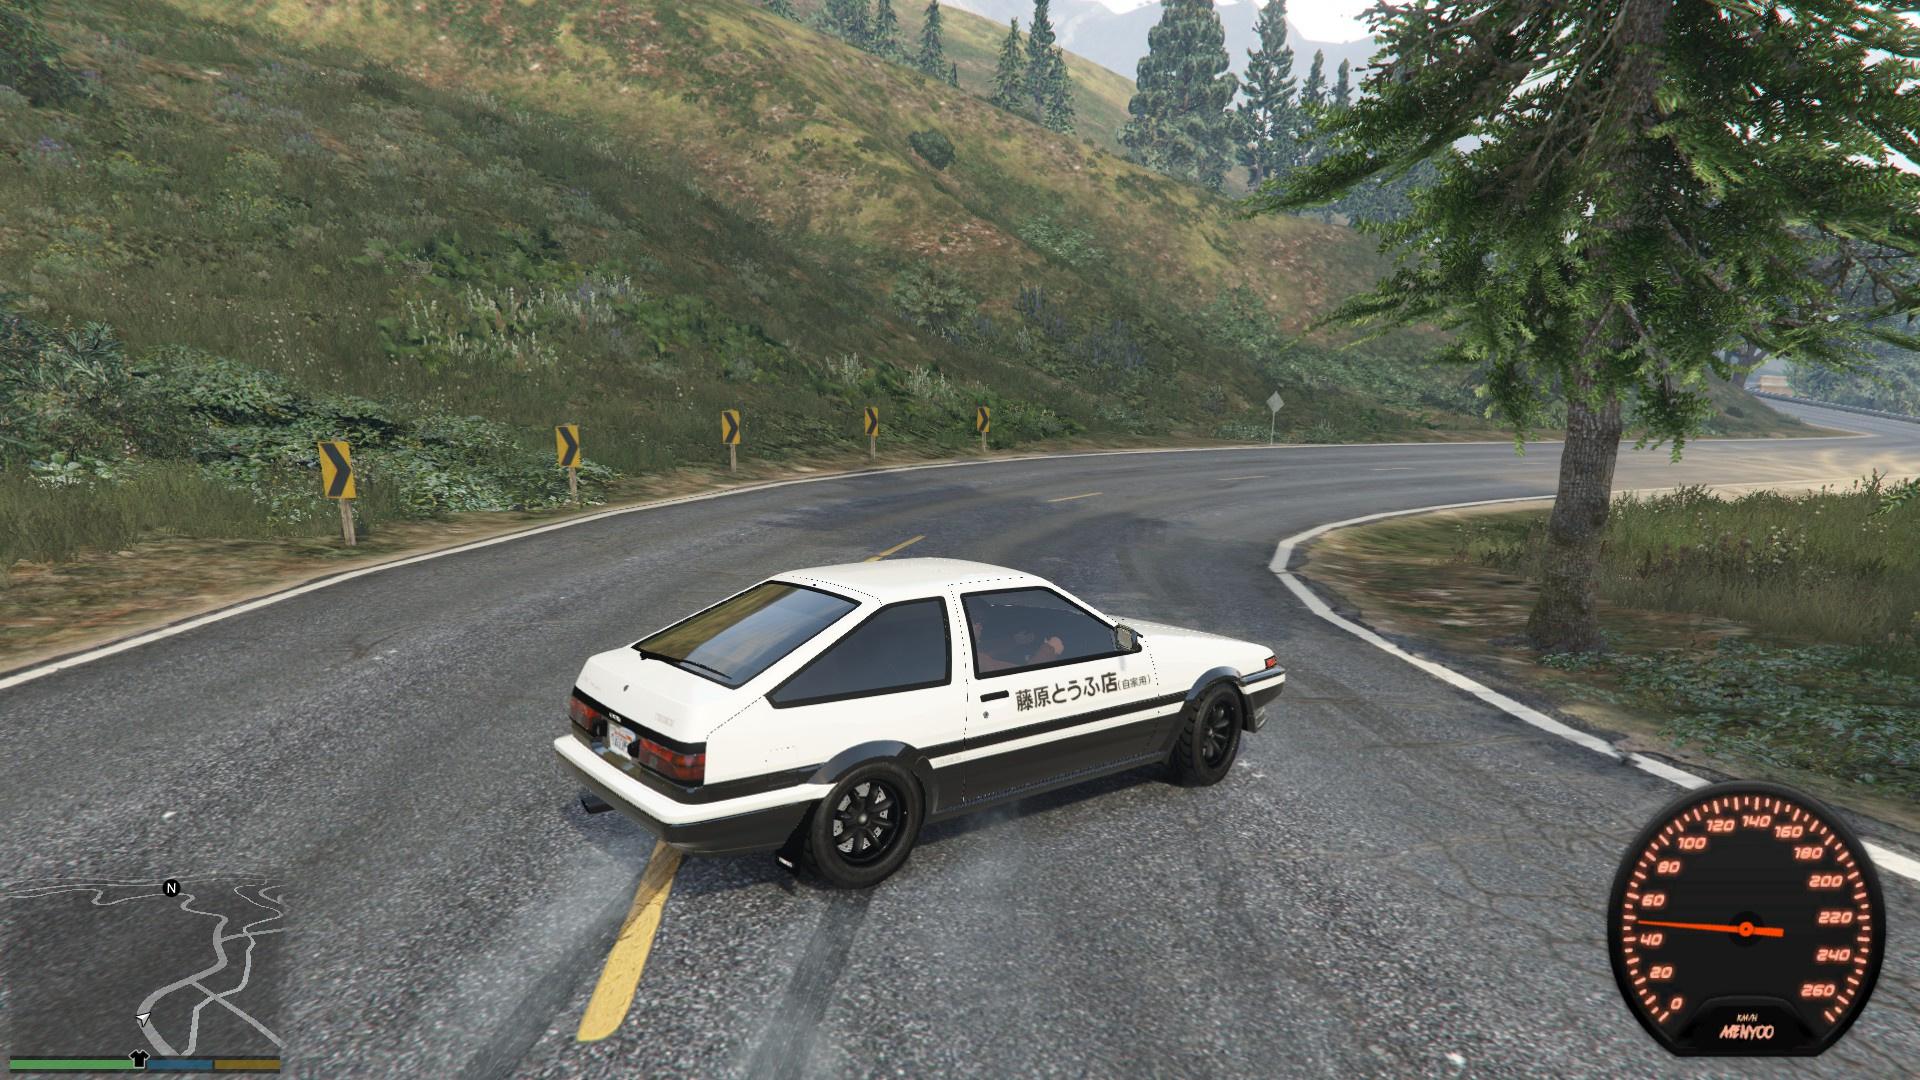 Ae86 Low Power Drift Handling Gta5 Mods Com